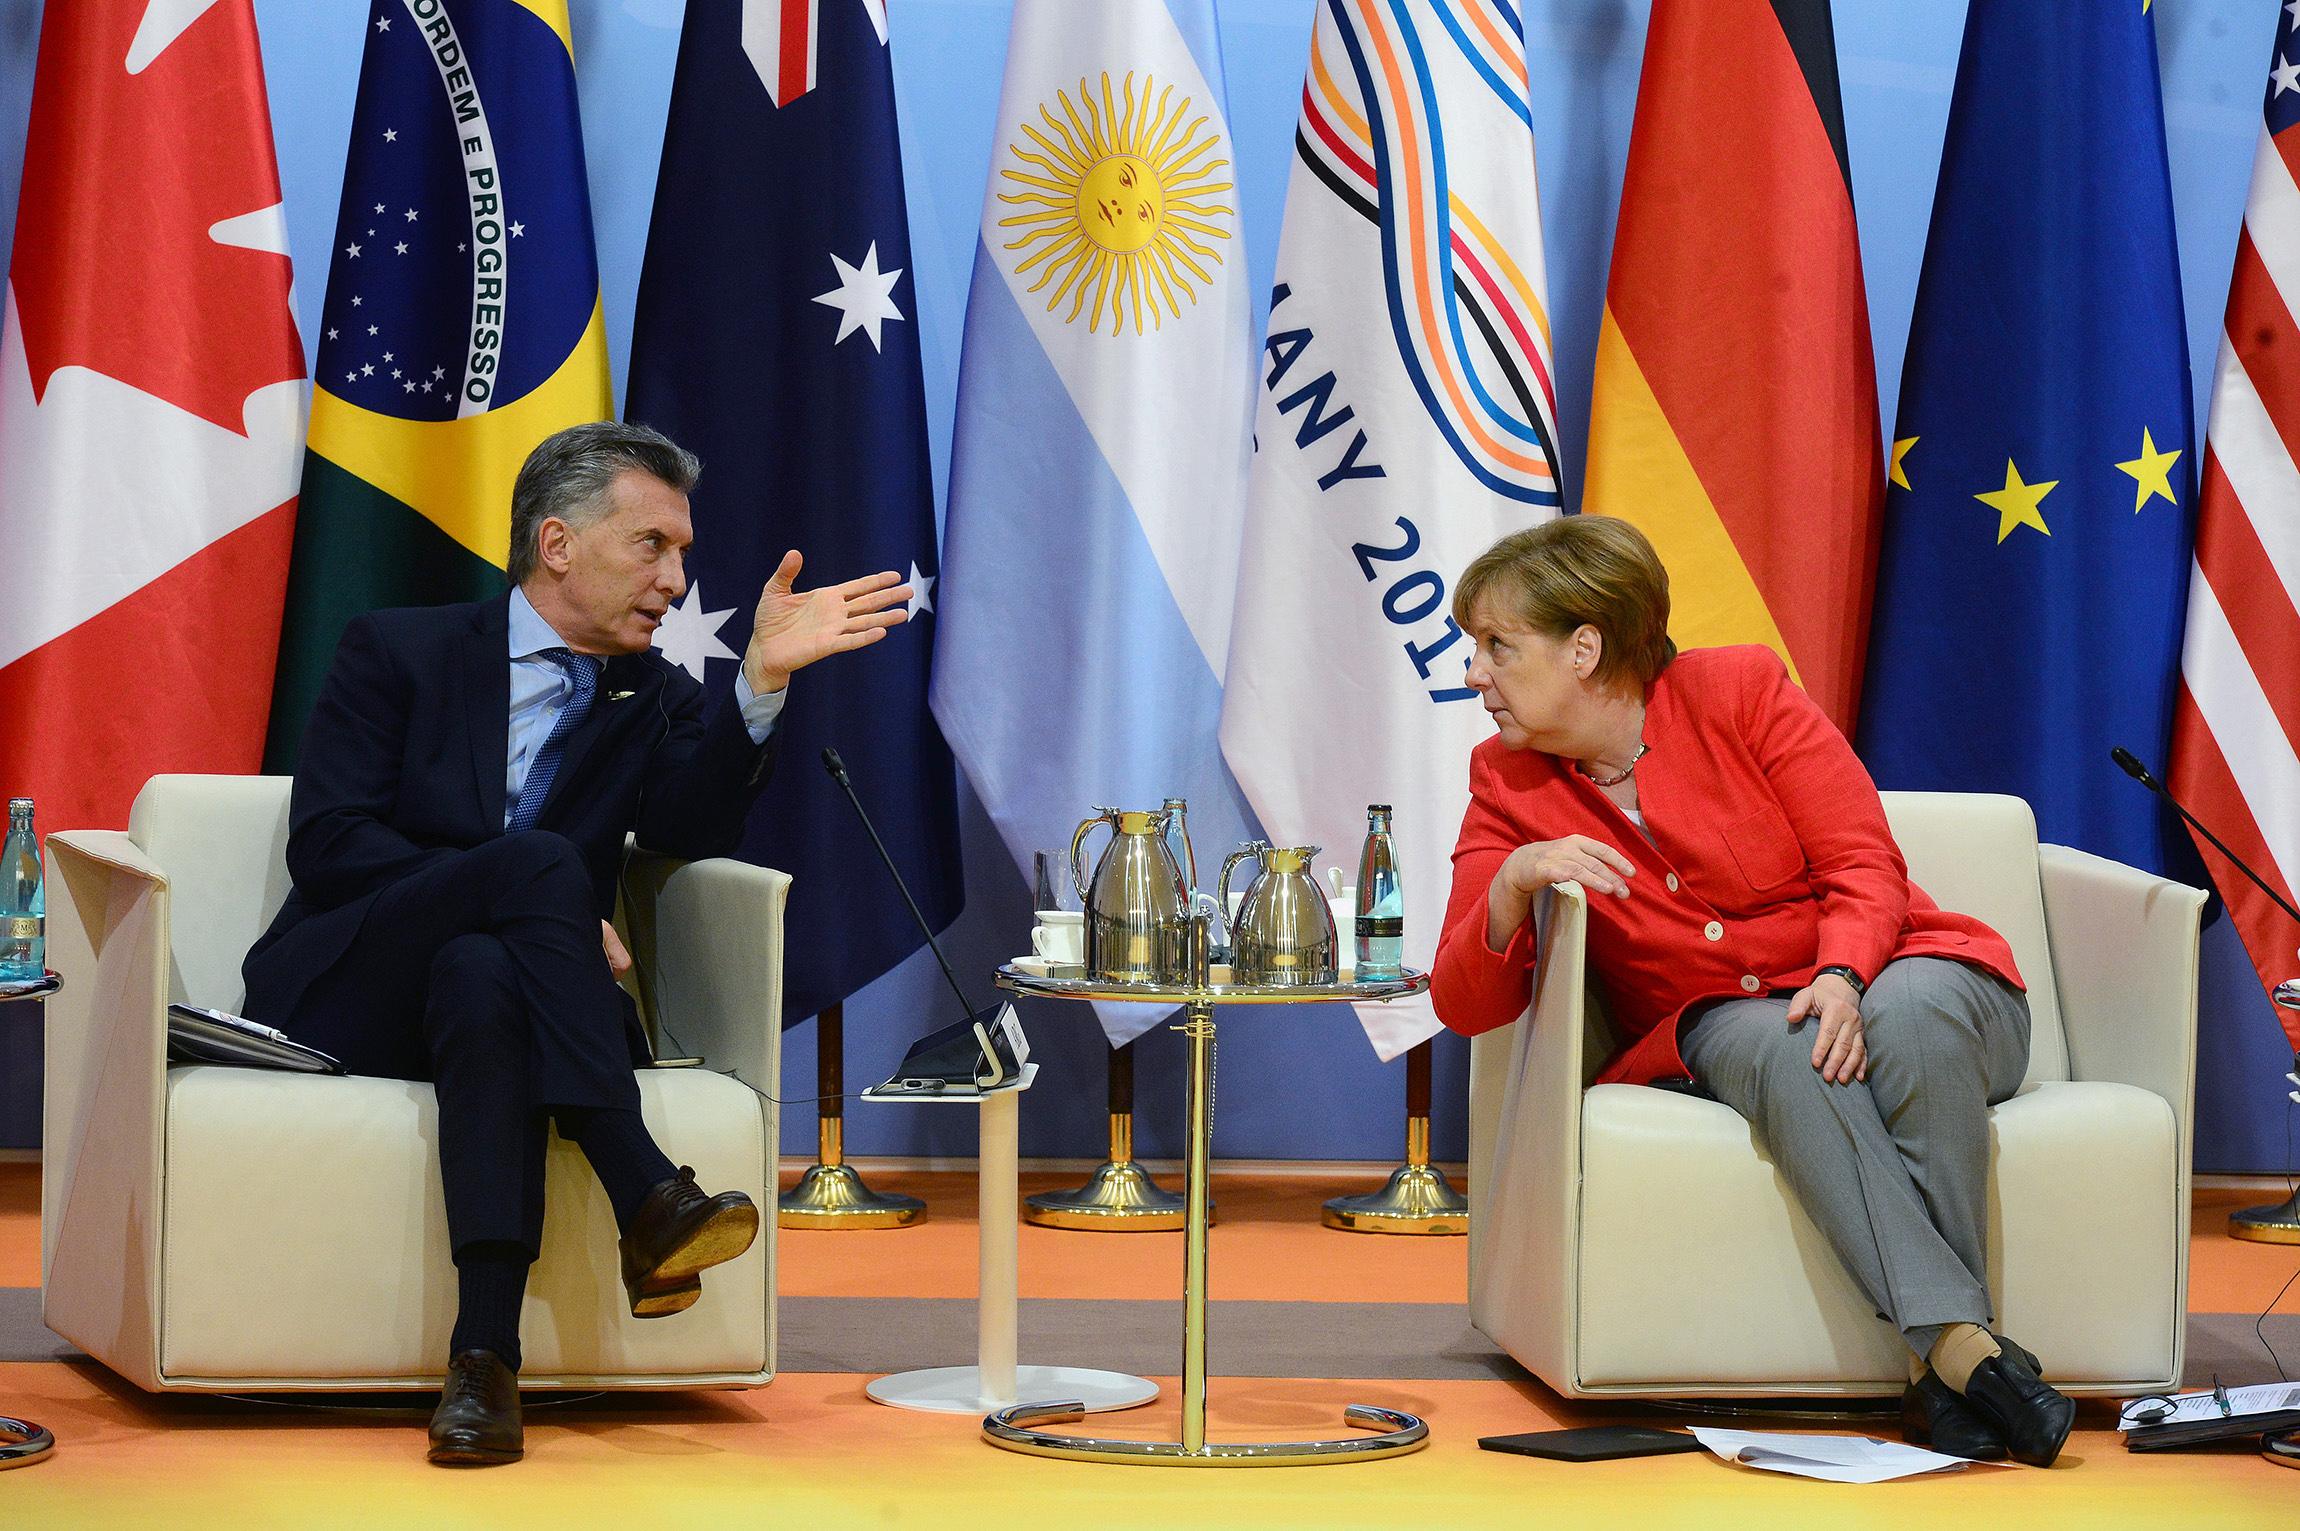 que es el g20 argentina